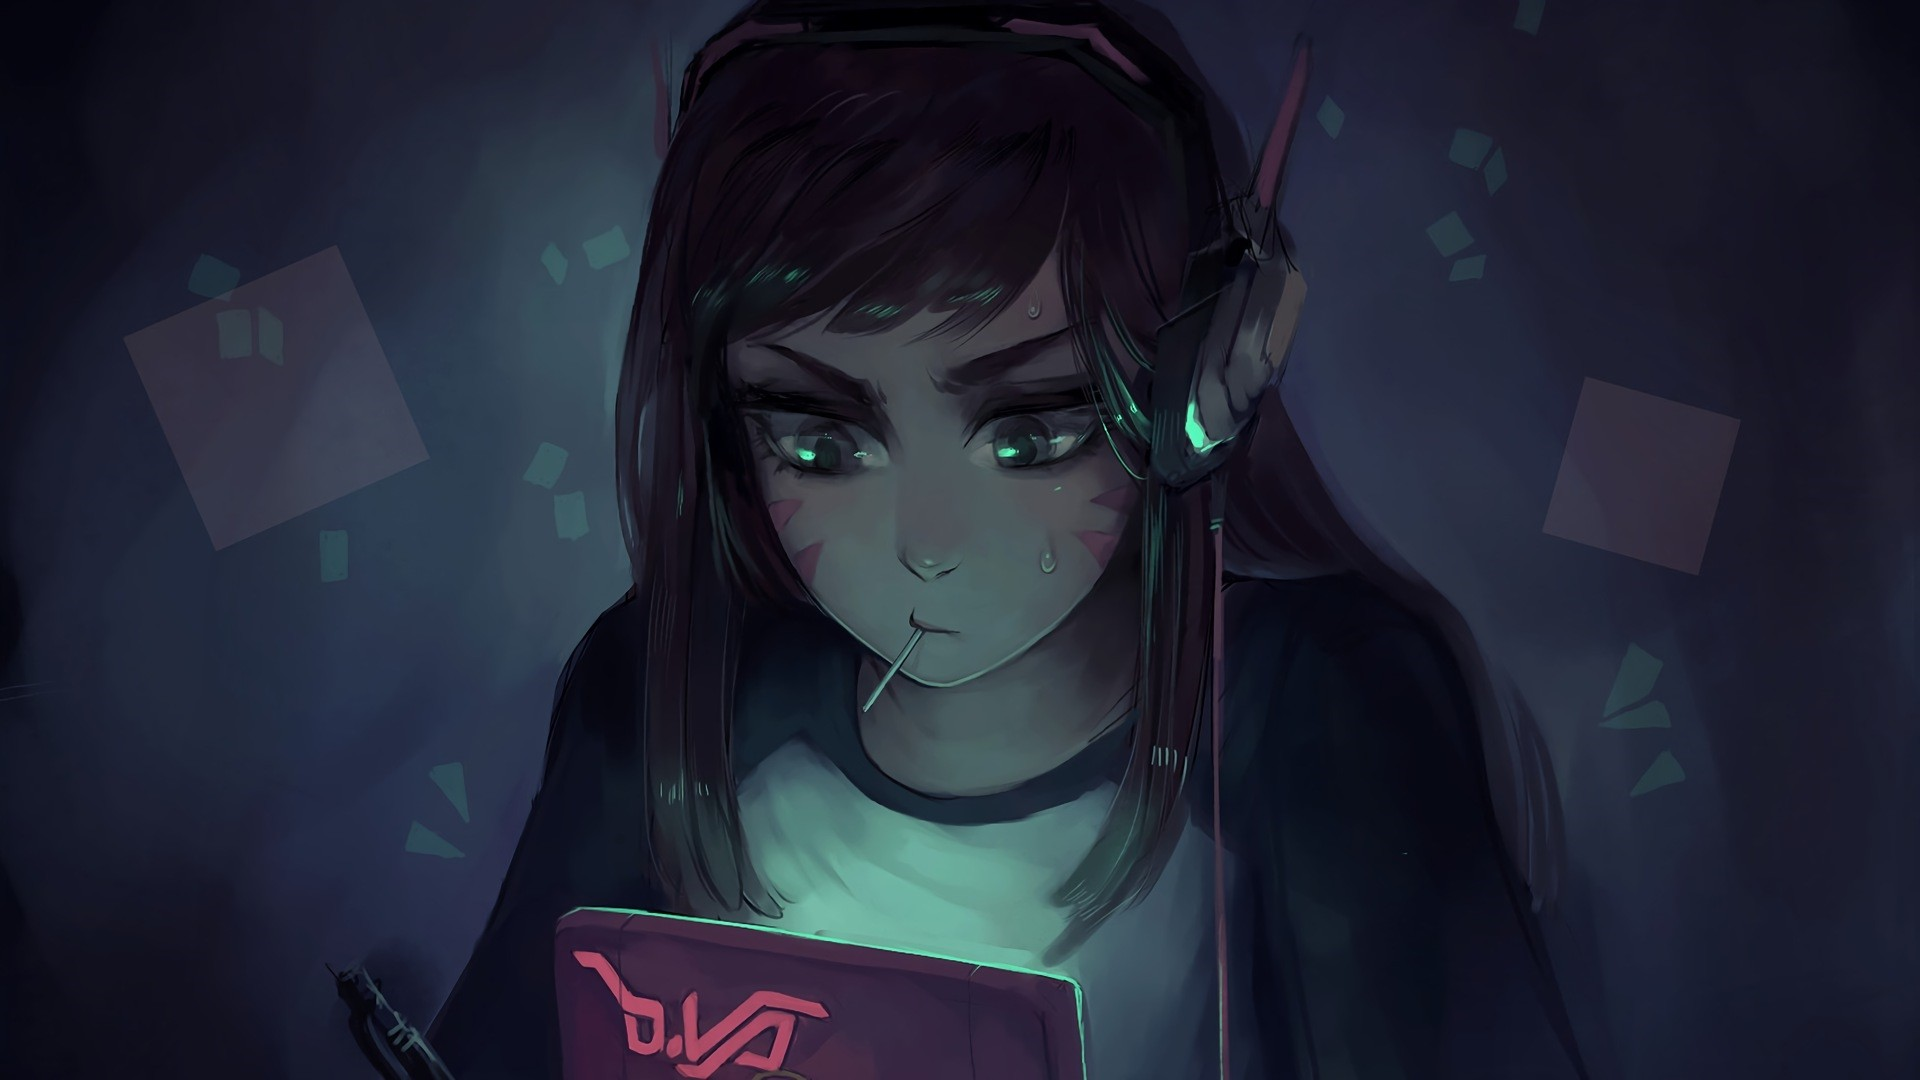 Gamer Girl Wallpapers (14 images) - WallpaperBoat